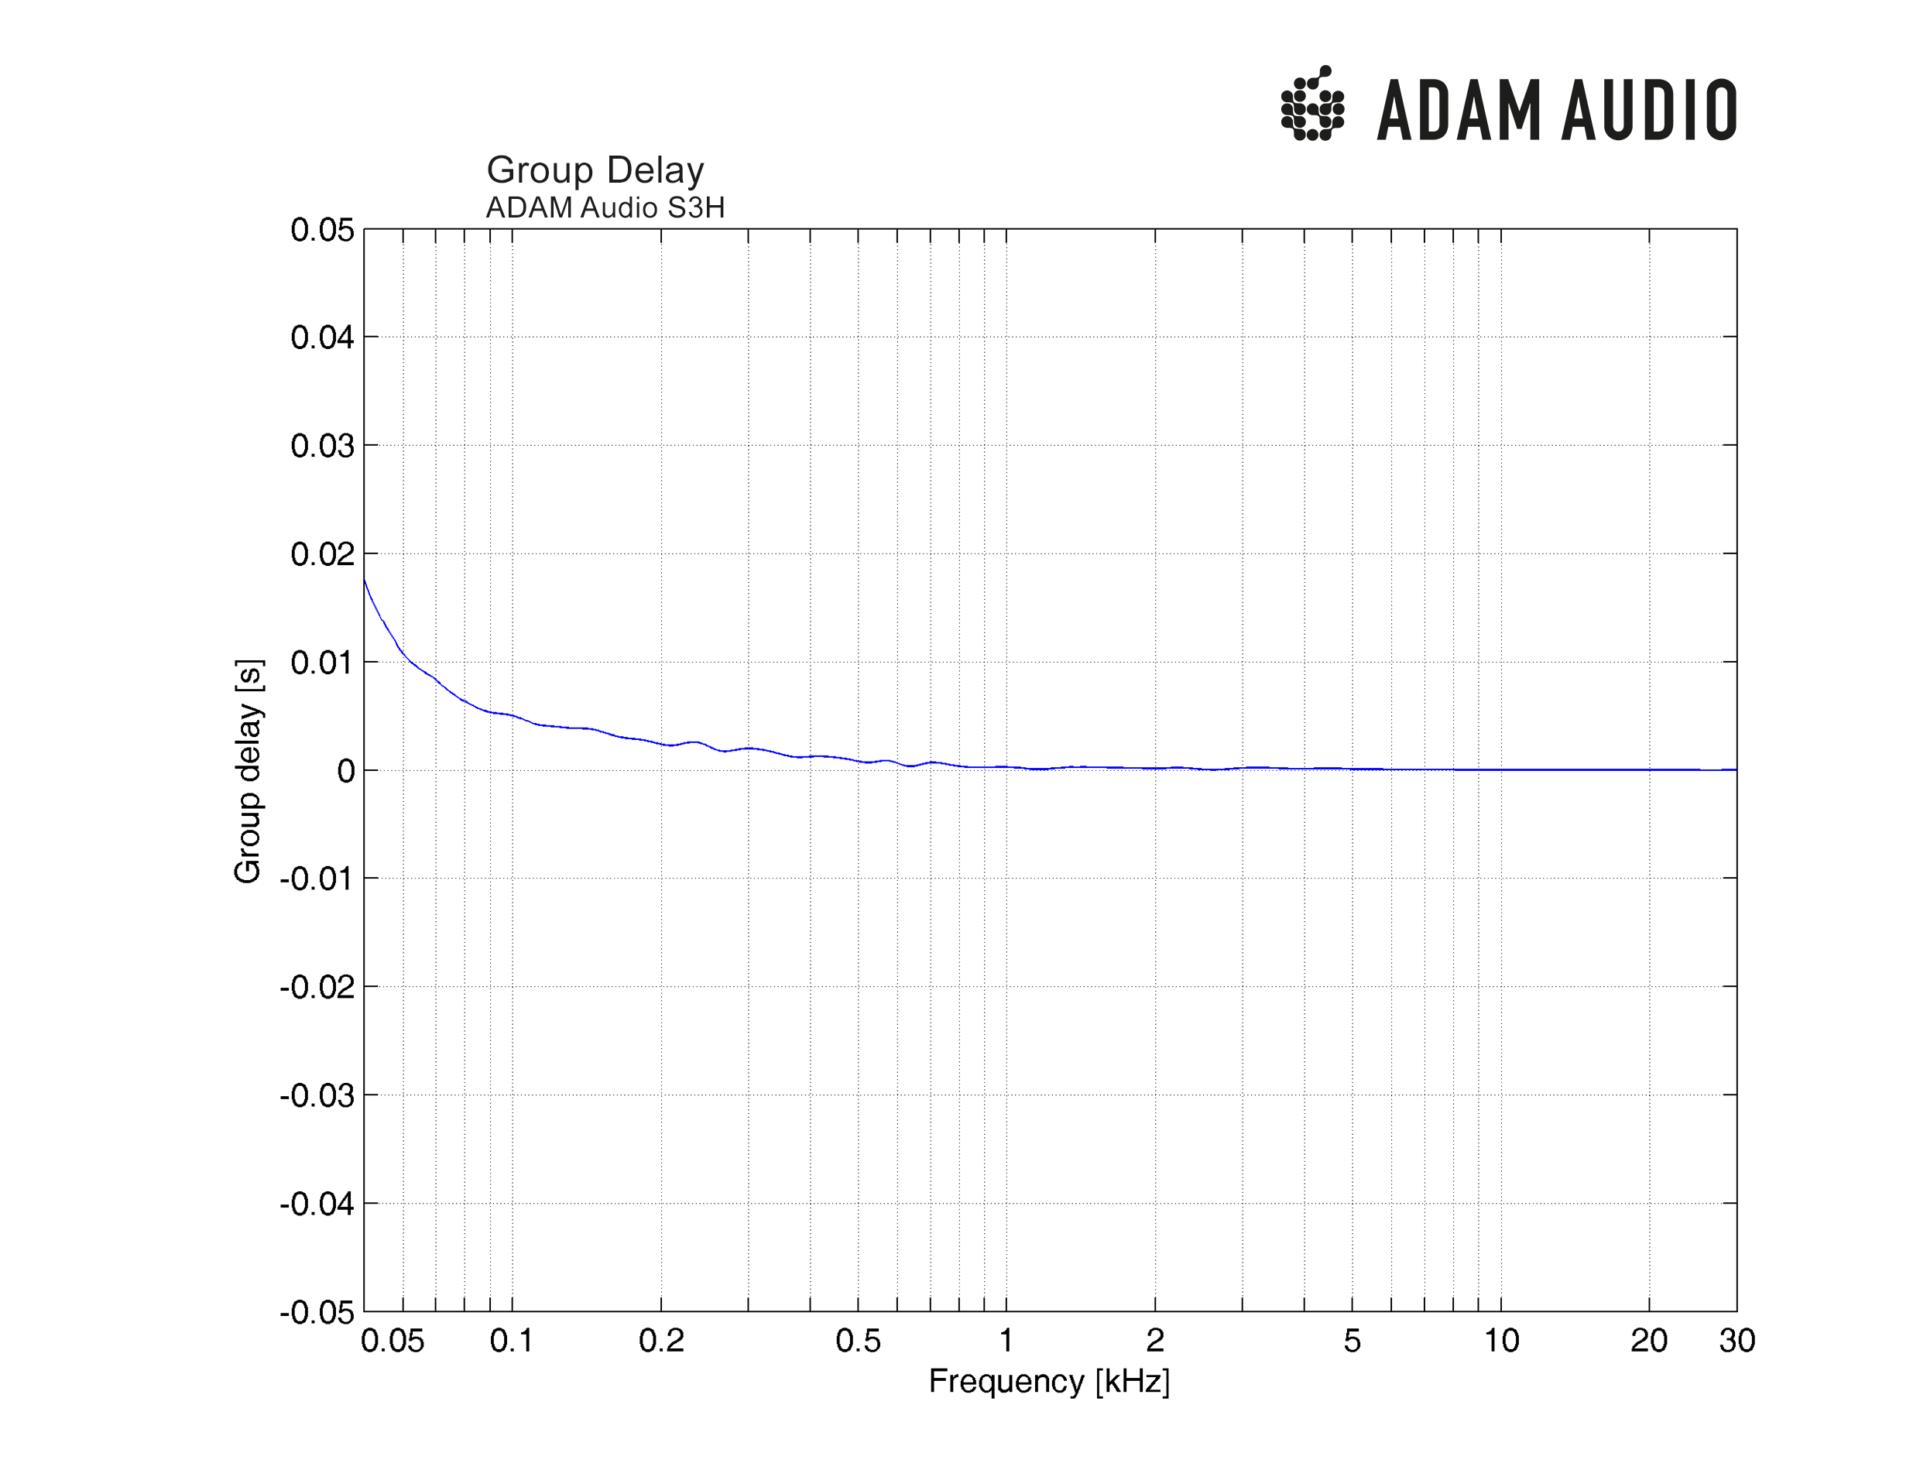 Adam Audio S3h Active Studio Monitor Midfield Snapshoot Of Series Stereo Headphone Amplifier Circuit Measurement Data